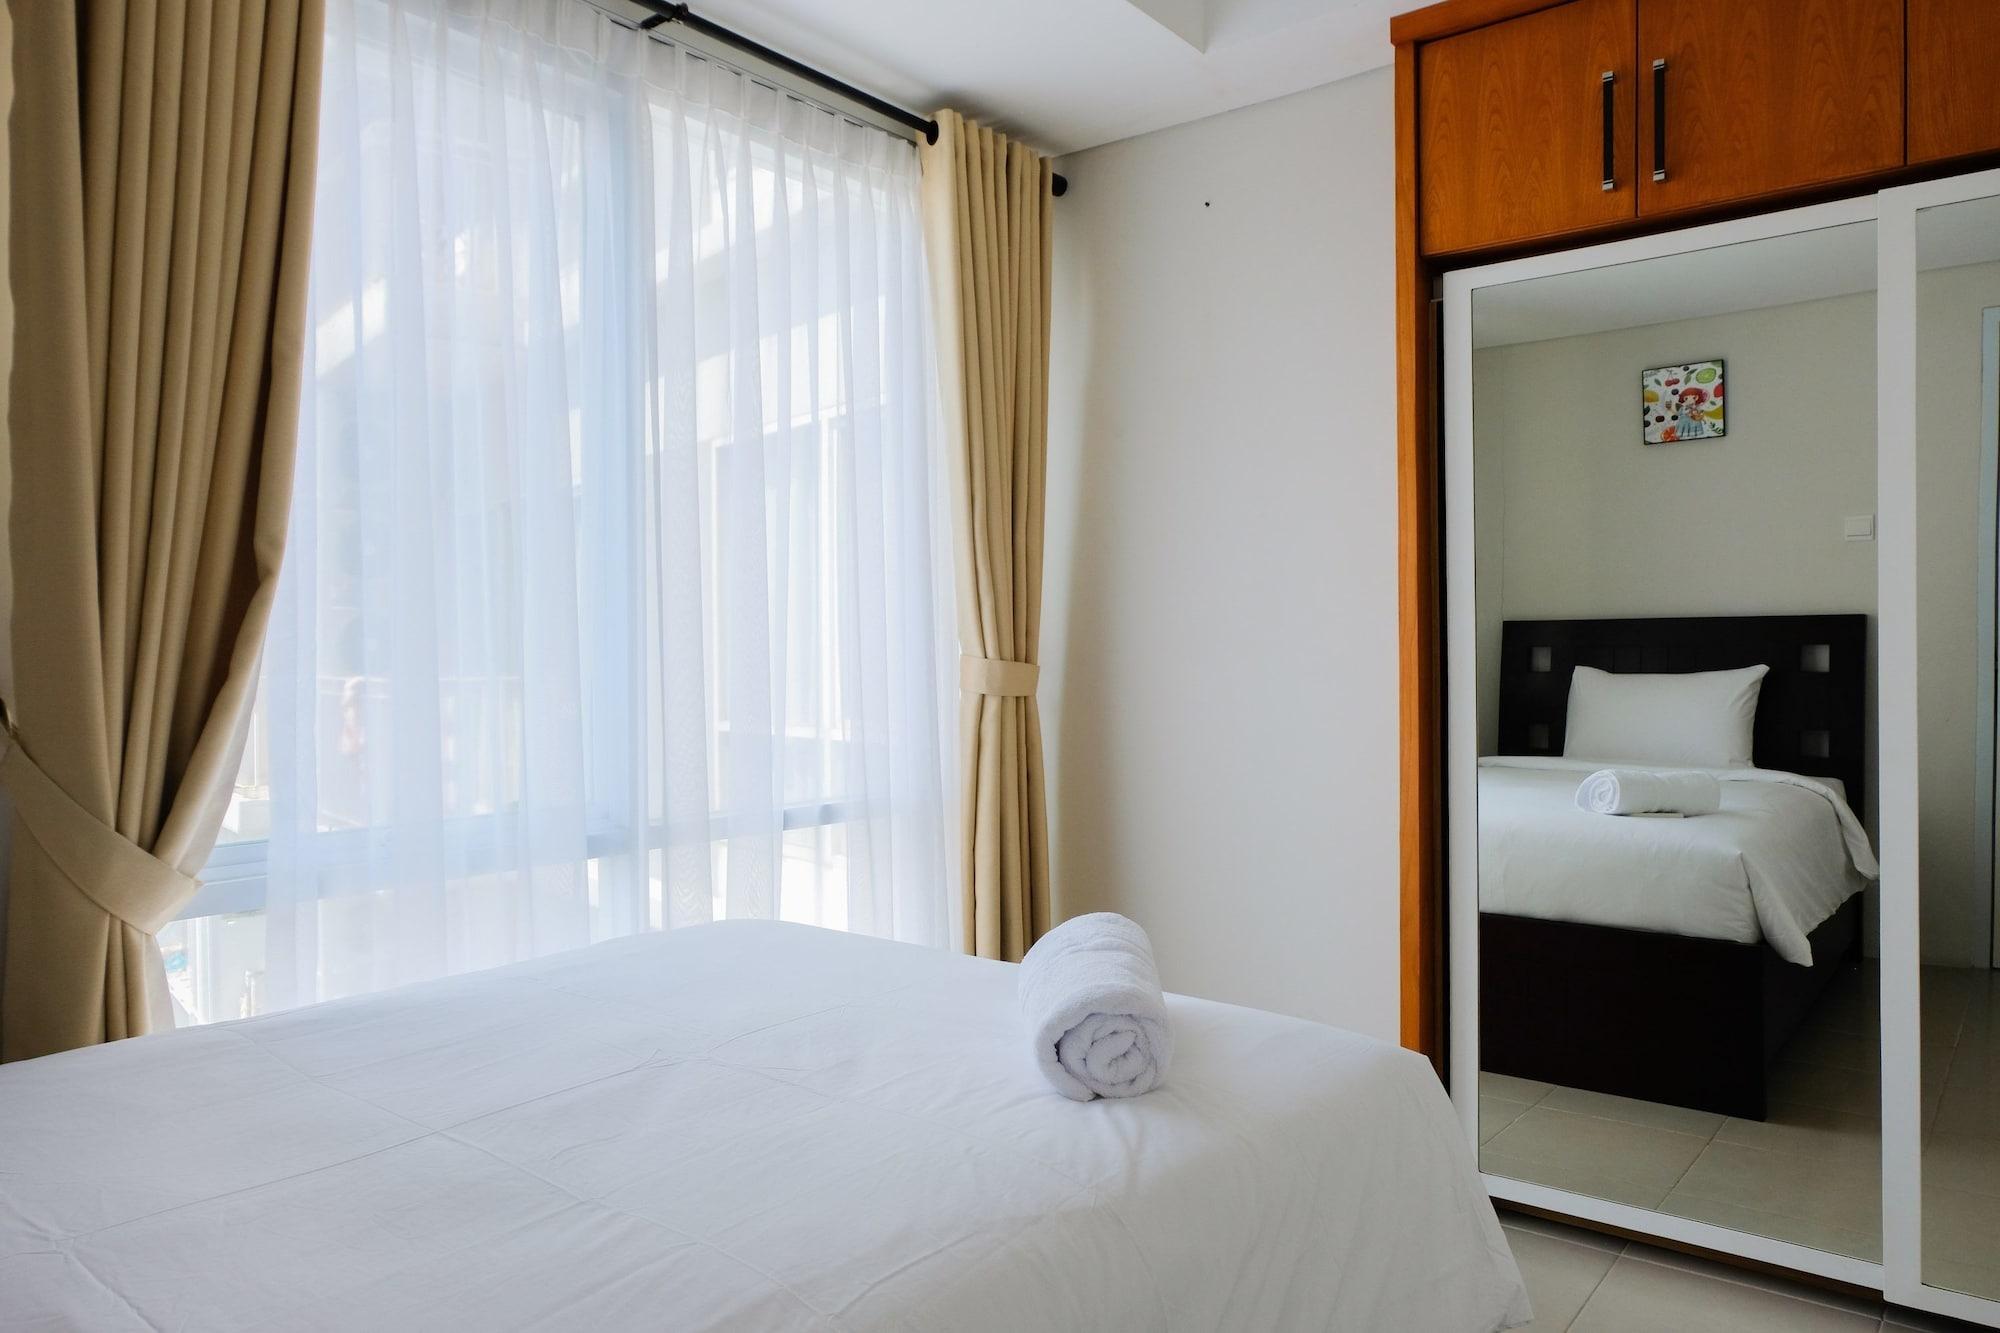 Brand New 2BR Apartment at Bintaro Plaza Residence, Tangerang Selatan